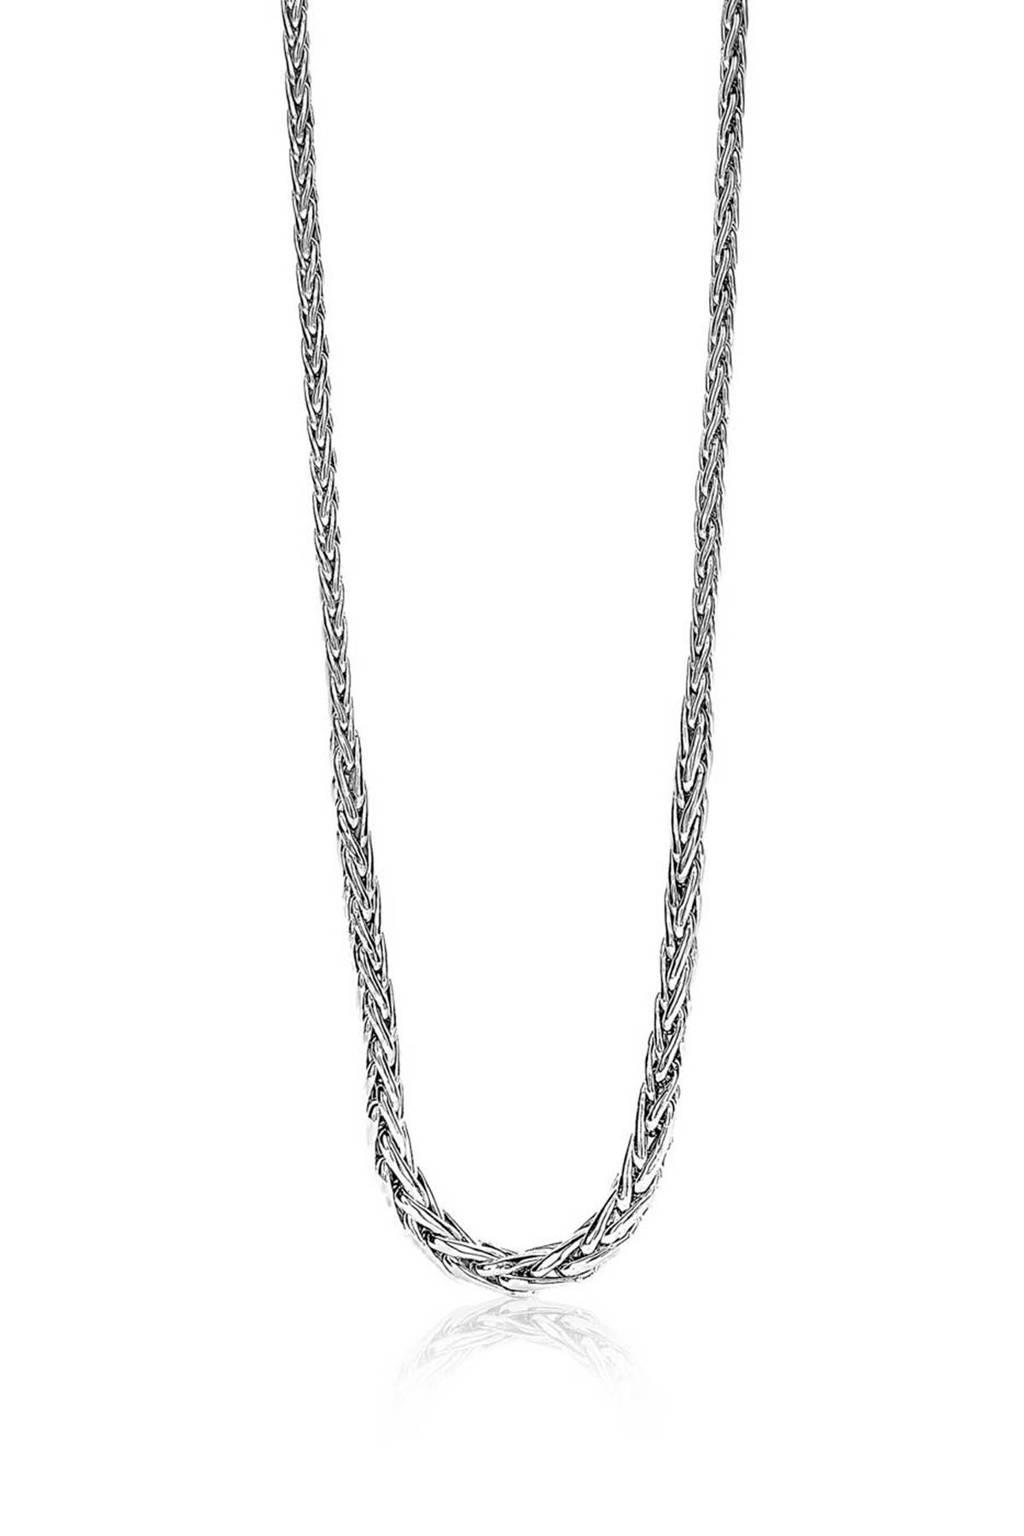 Zinzi ketting - ZIC1628, Zilver